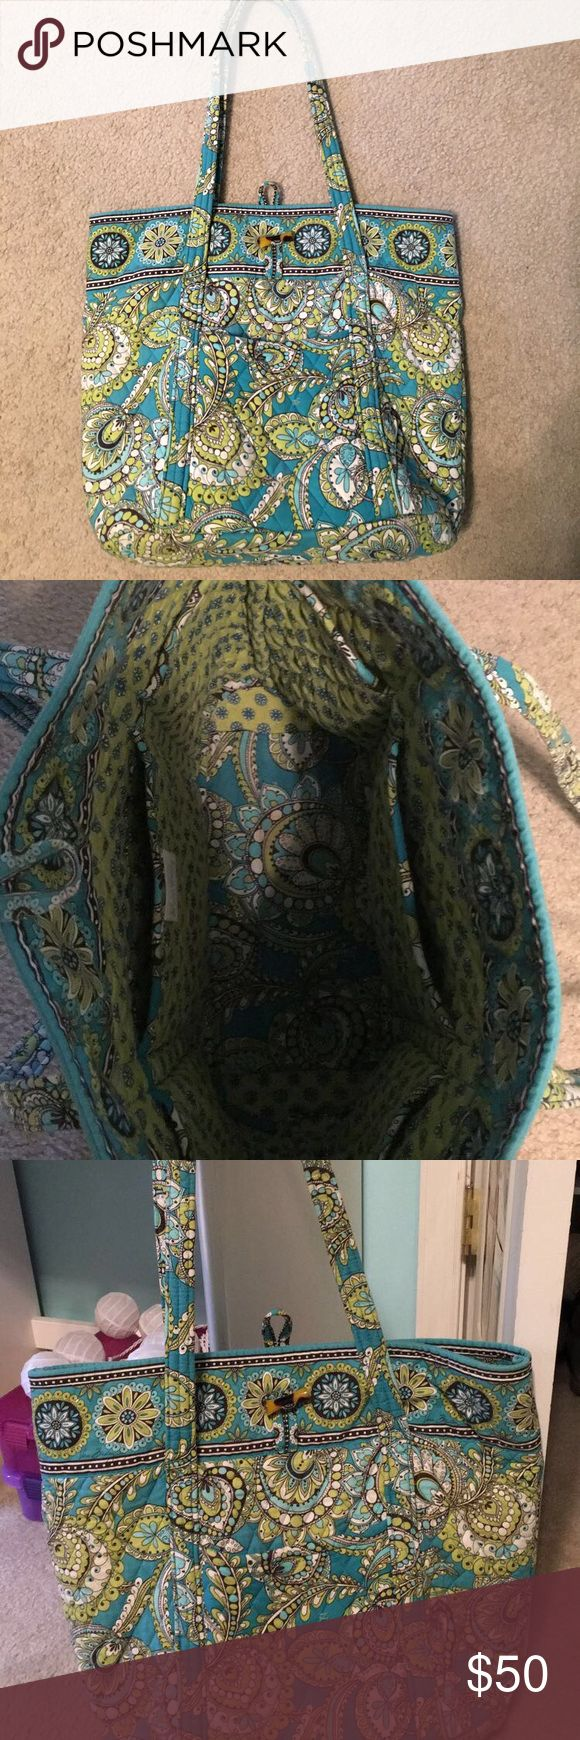 Vera Bradley tote bag Discontinued pattern Vera Bradley tote bag Vera Bradley Bags Totes